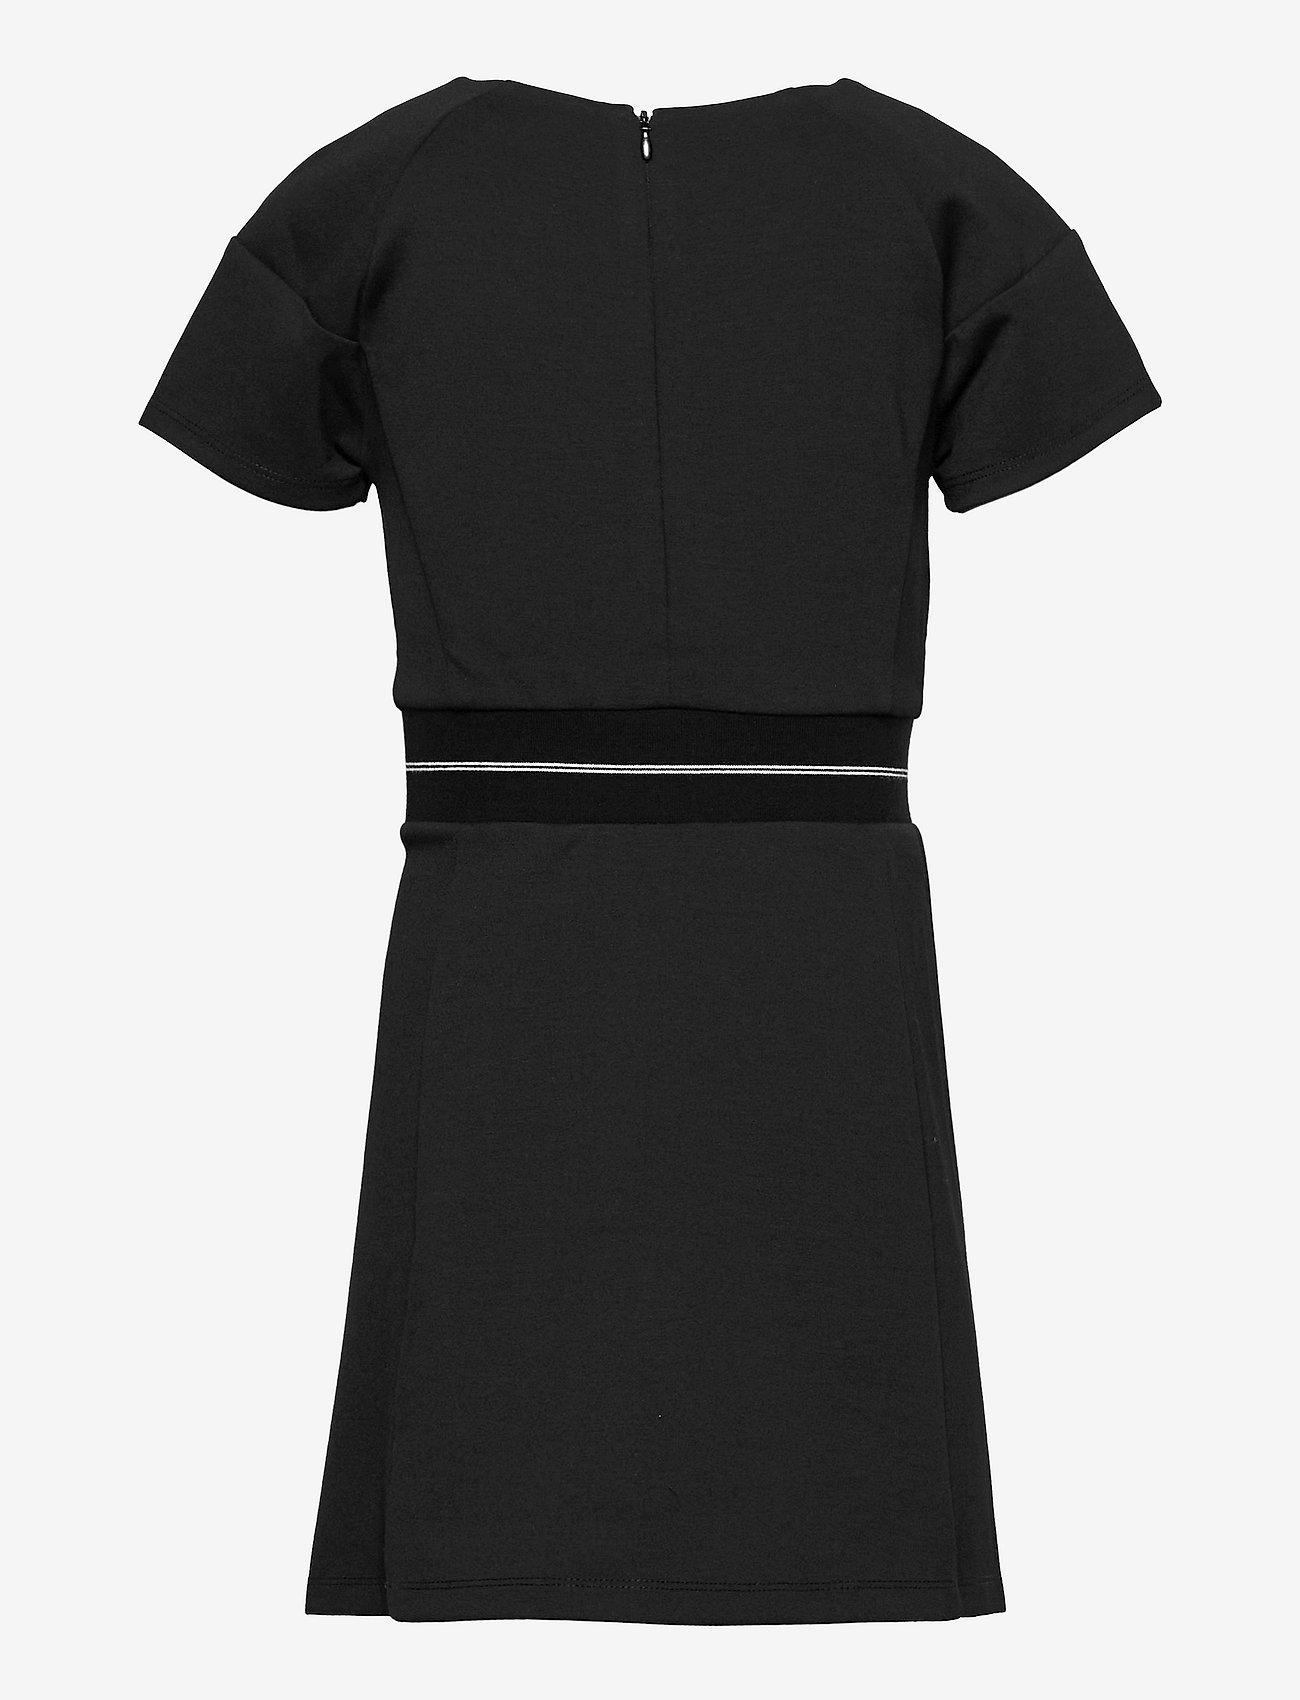 Calvin Klein - INTARSIA LOGO WAIST PUNTO DRESS - kleider - ck black - 1